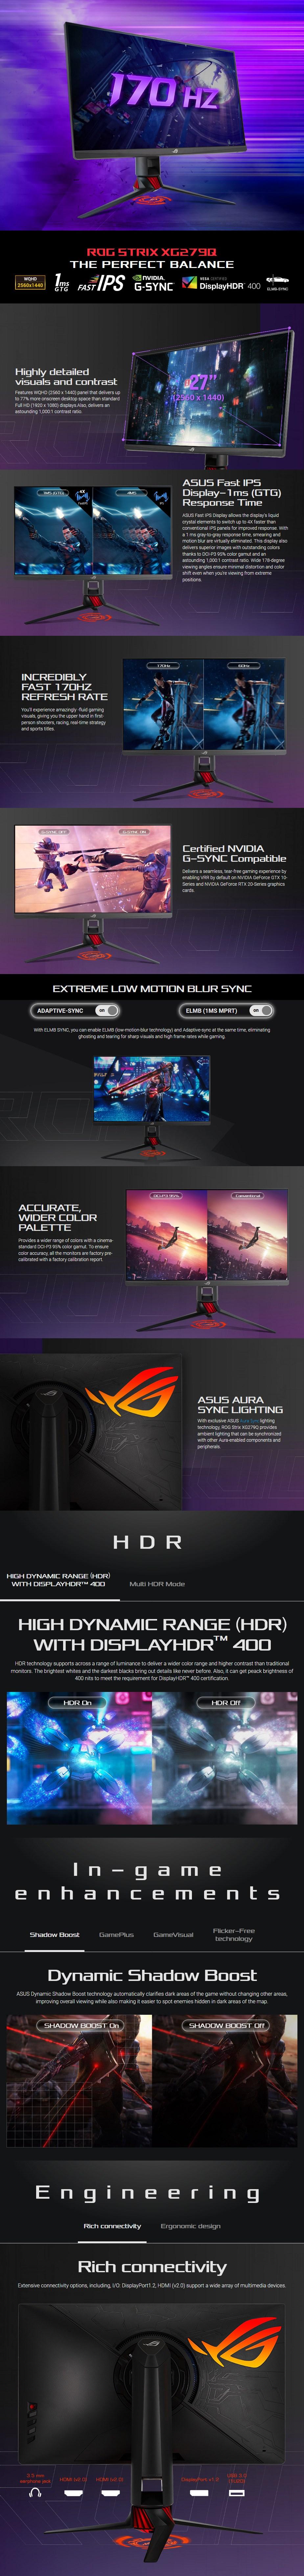 "ASUS ROG Strix XG279Q 27"" 170Hz WQHD 1ms G-Sync Ready HDR Gaming Monitor - Overview 1"